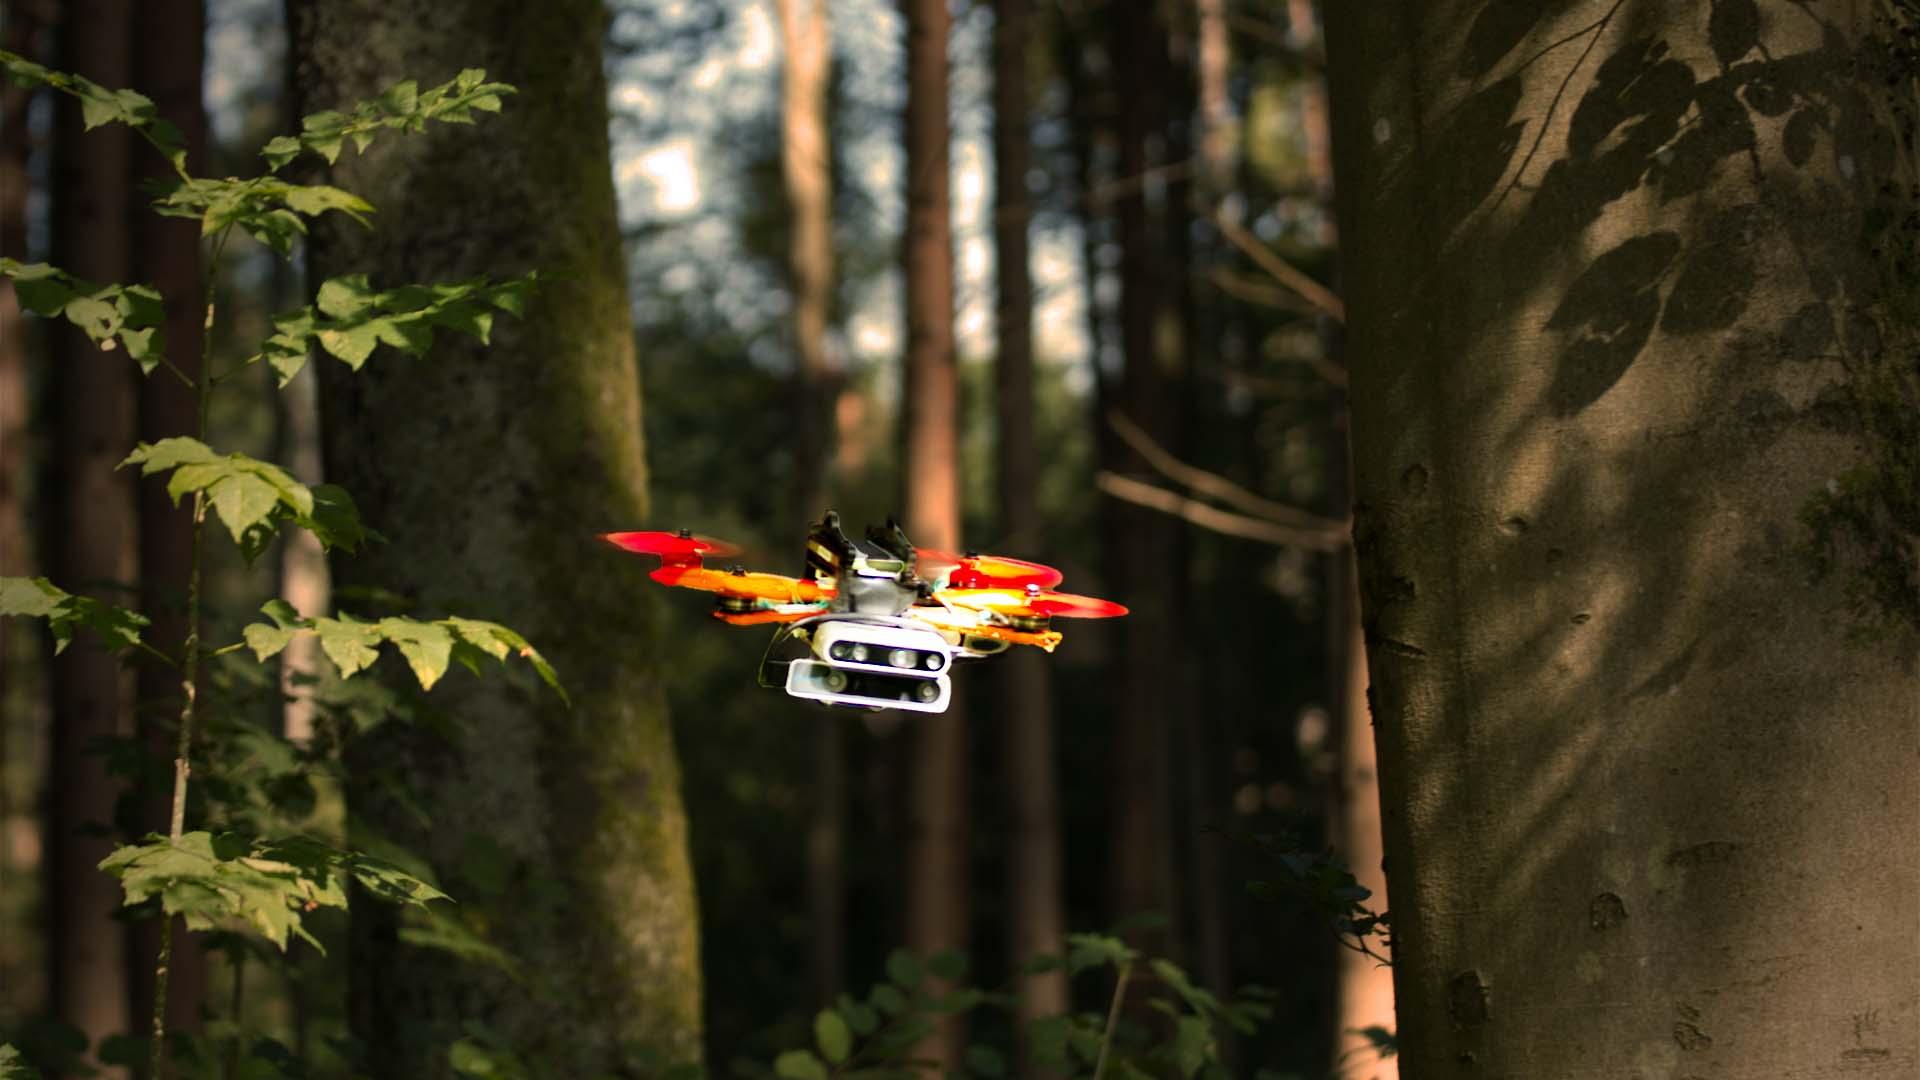 Autonome Drohnen in unbekanntem Terrain.